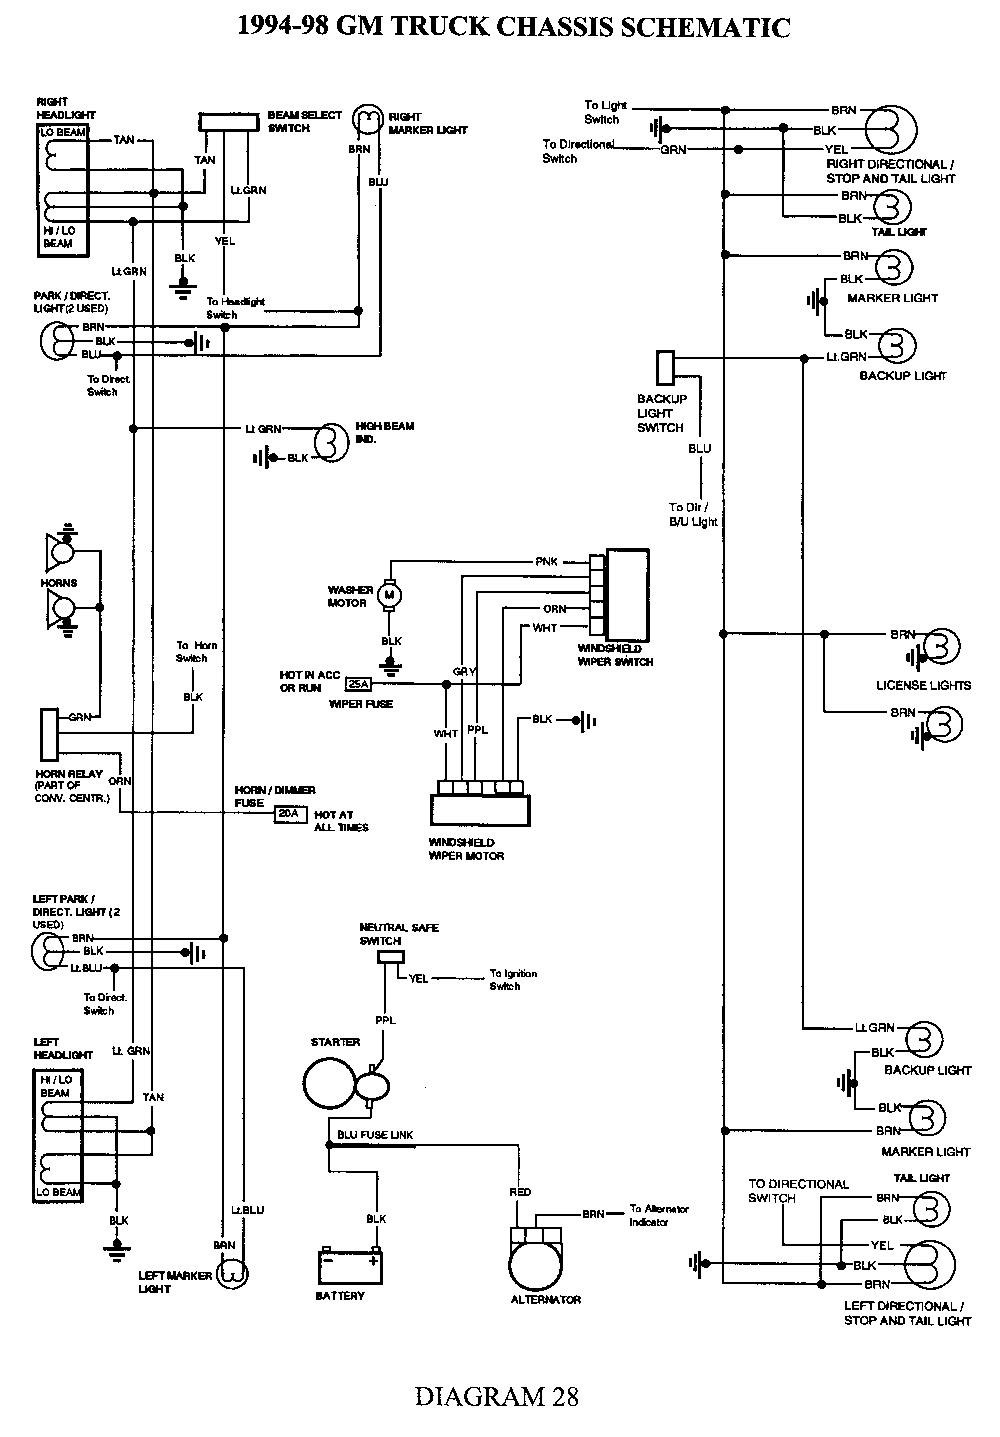 98 Chevy 2500 Headlight Switch Wiring Wiring Diagram Perfomance 200 Topkick Headlight Switch Wiring Diagram Source 1995 yamaha kodiak